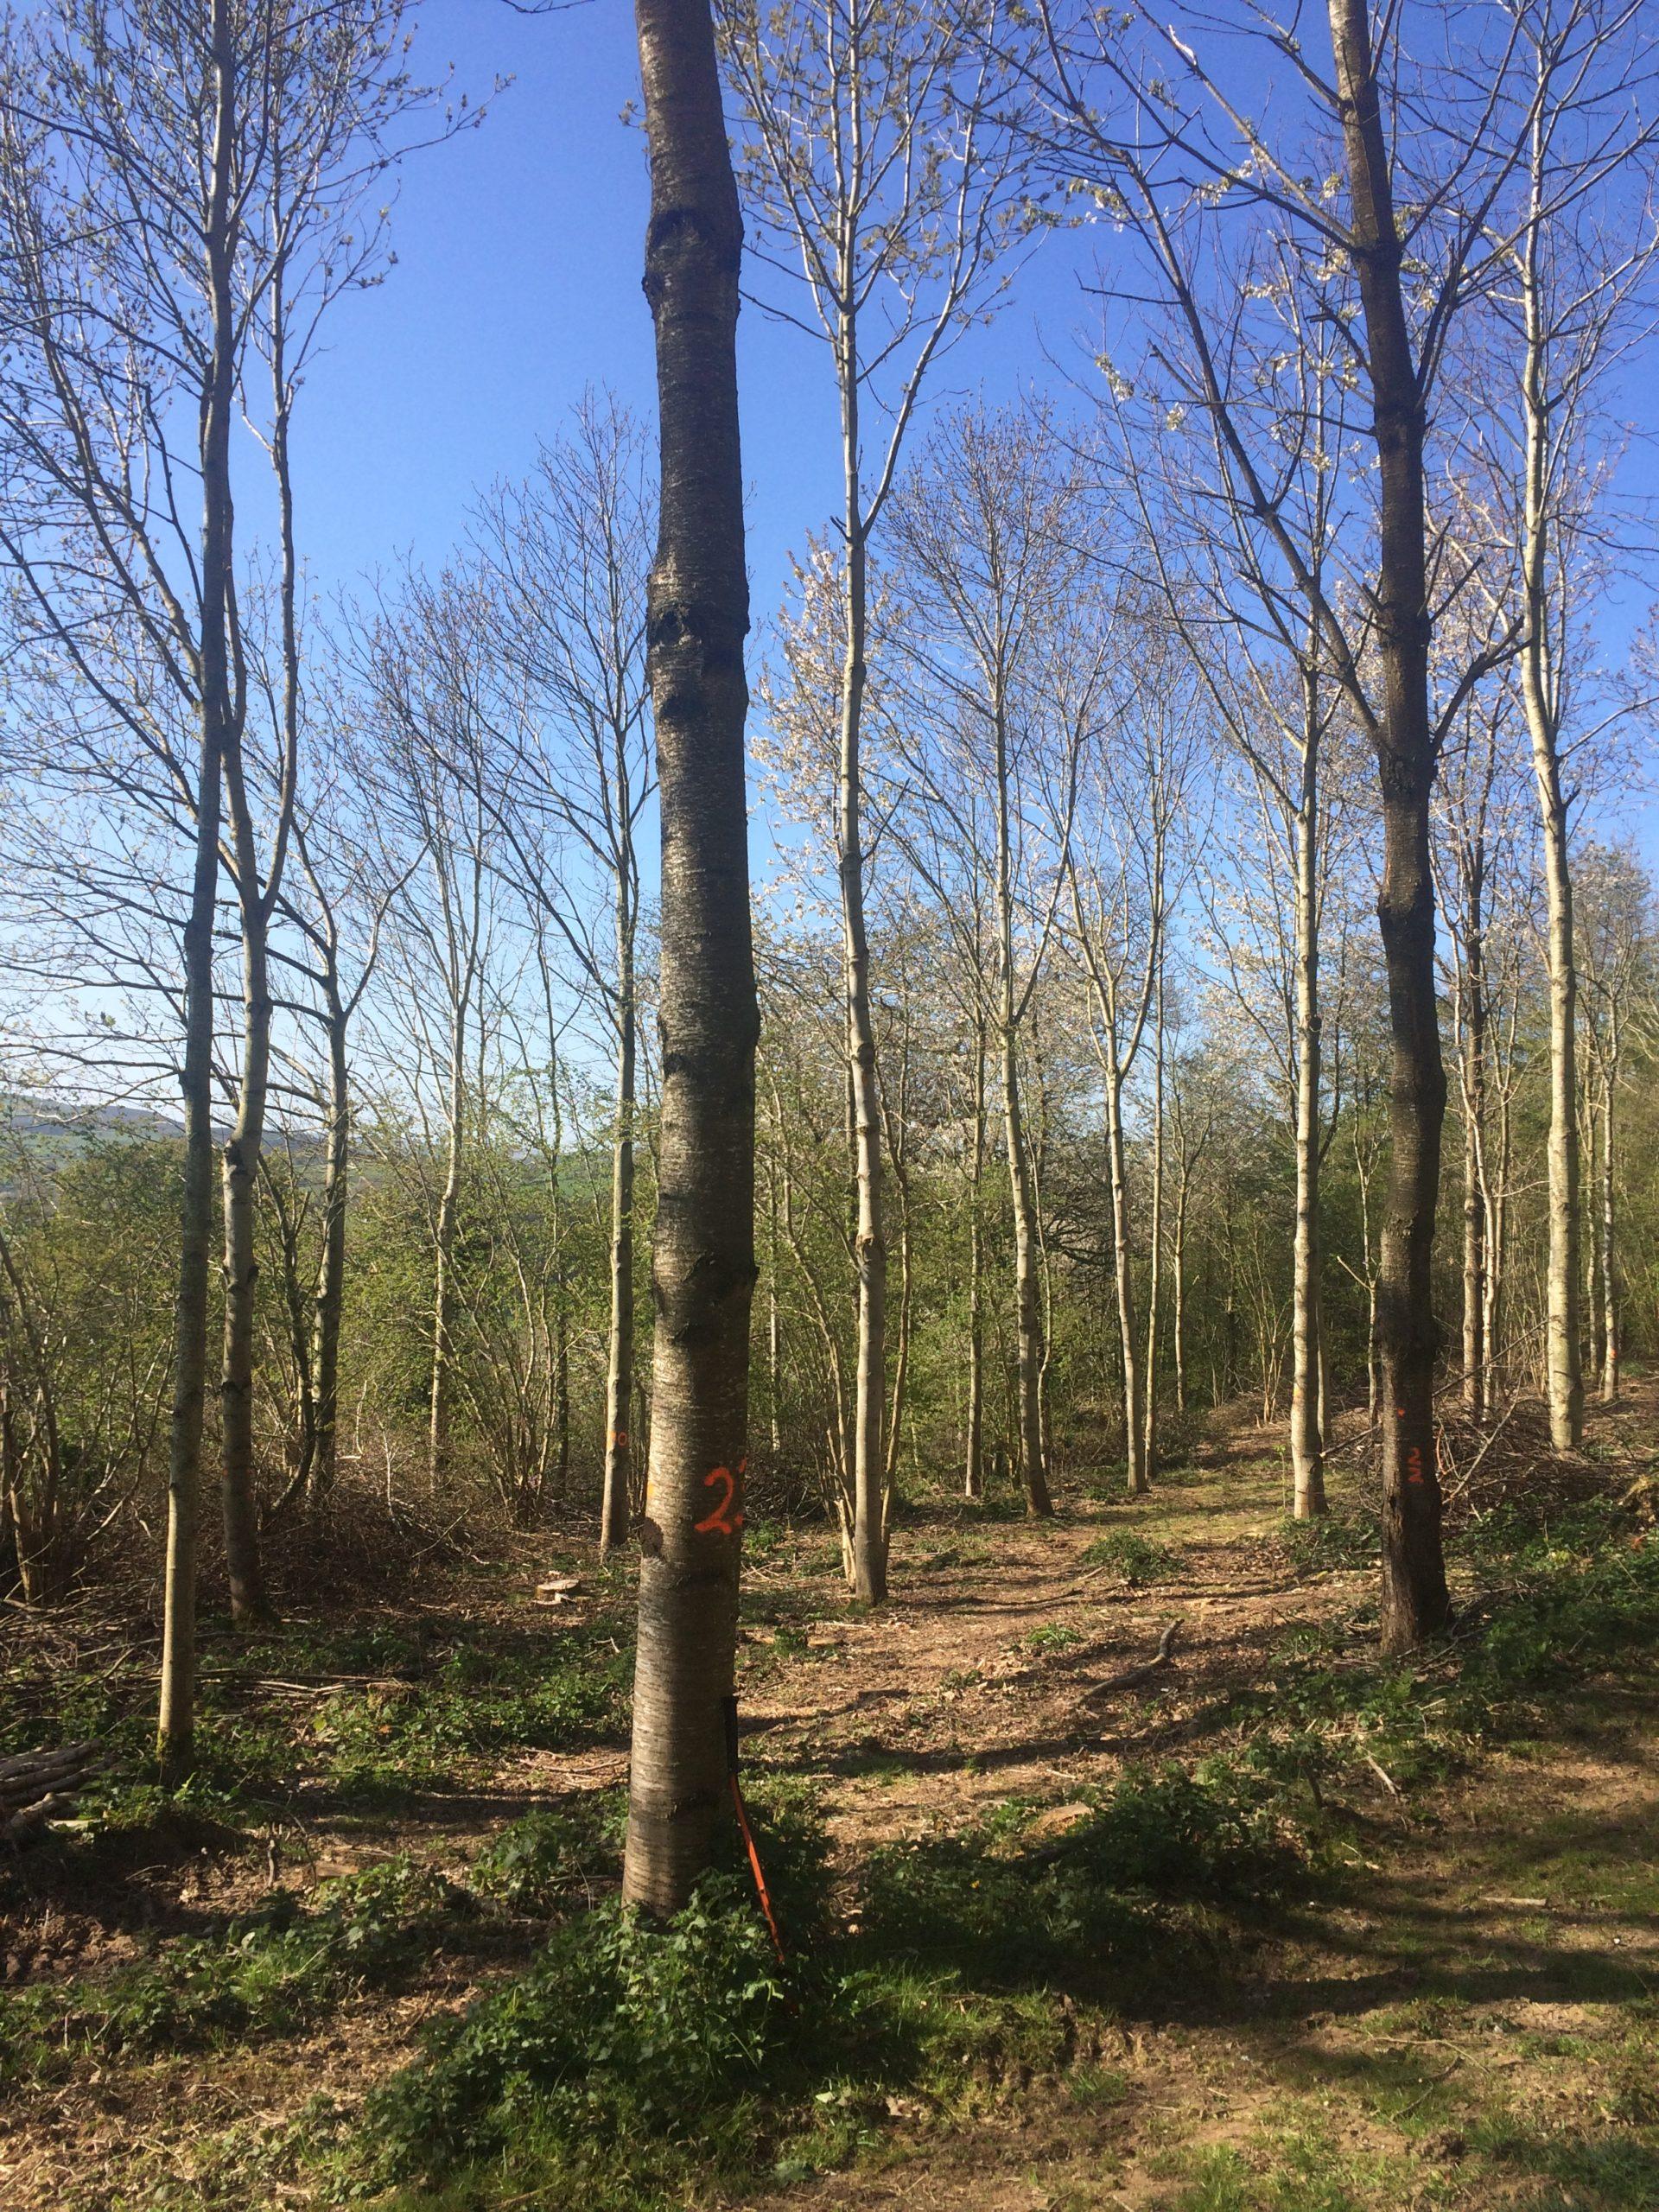 Growing broadleaf for timber